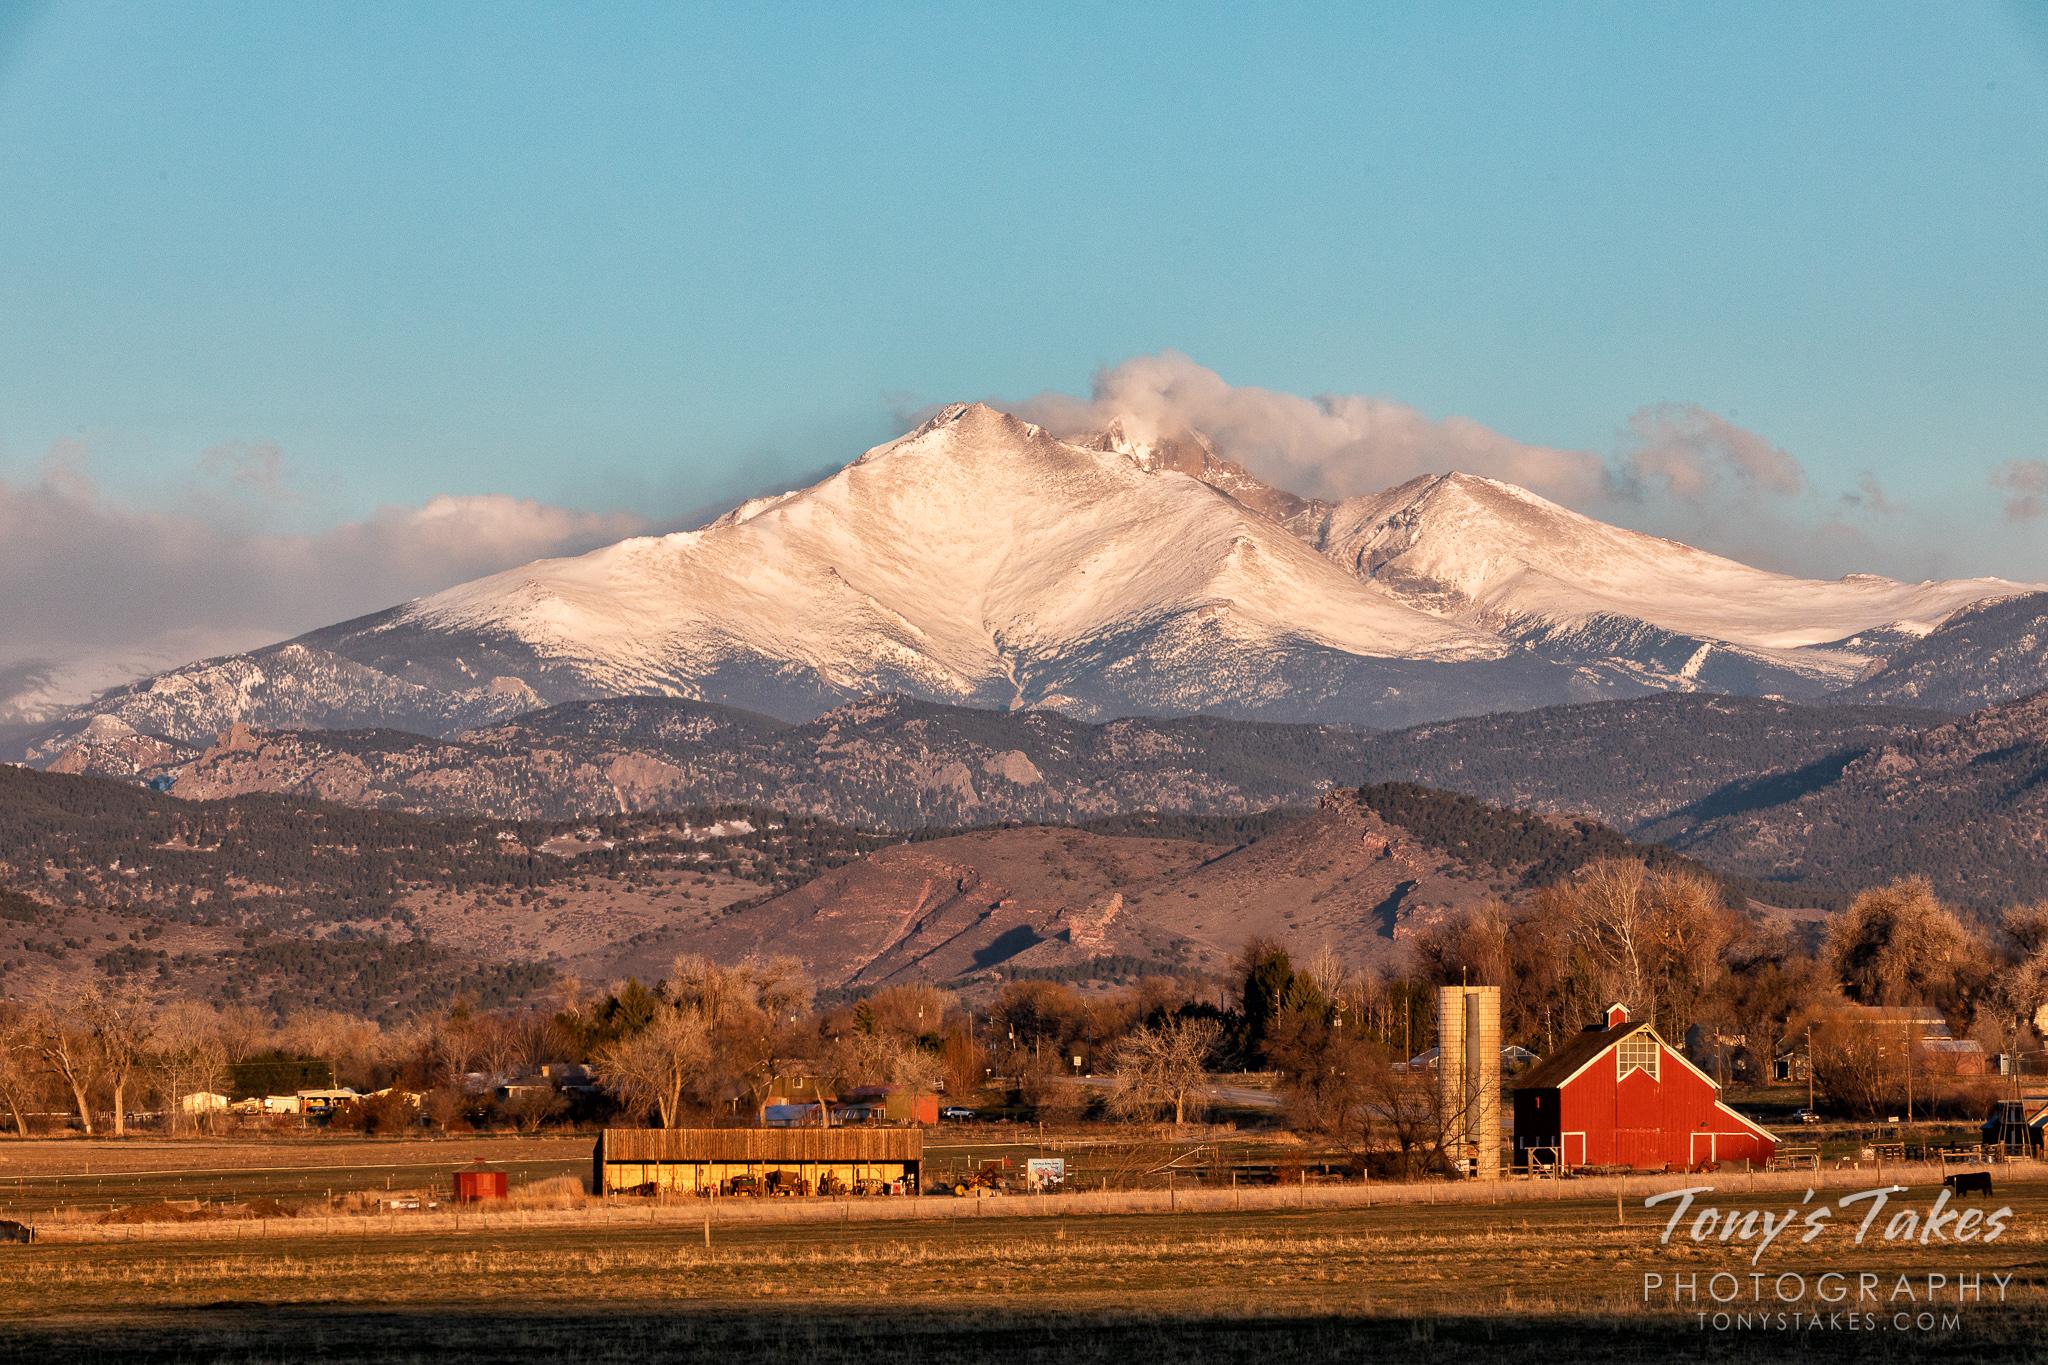 Little barn, big mountains